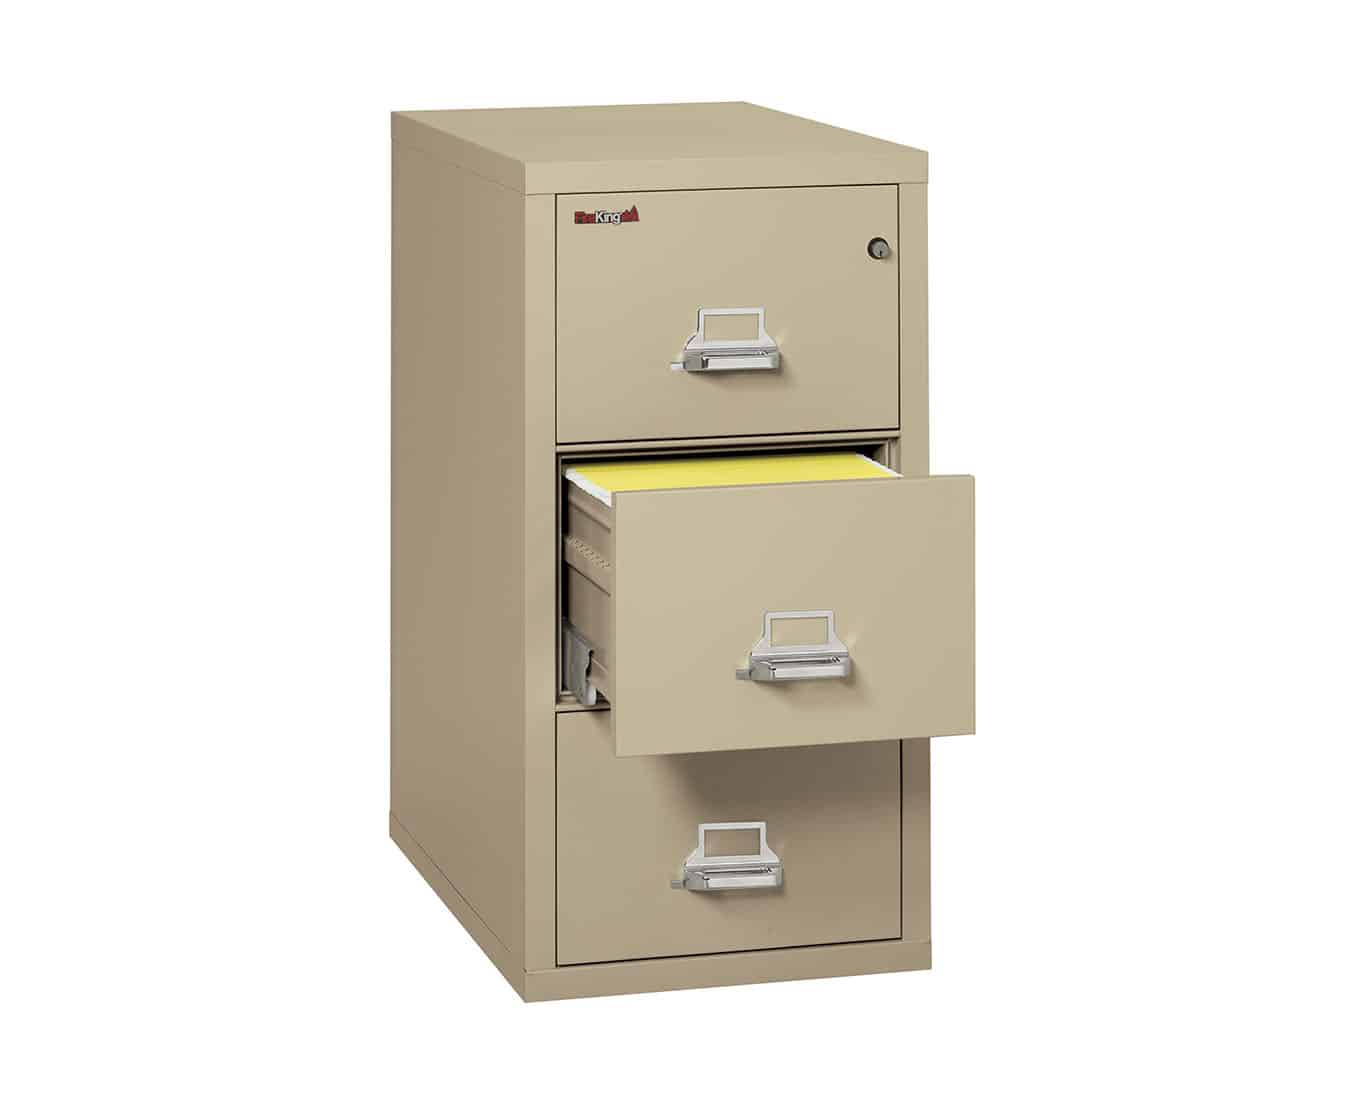 FireKing Vertical File Cabinet 3-2131-C (3 Drawer Legal ...